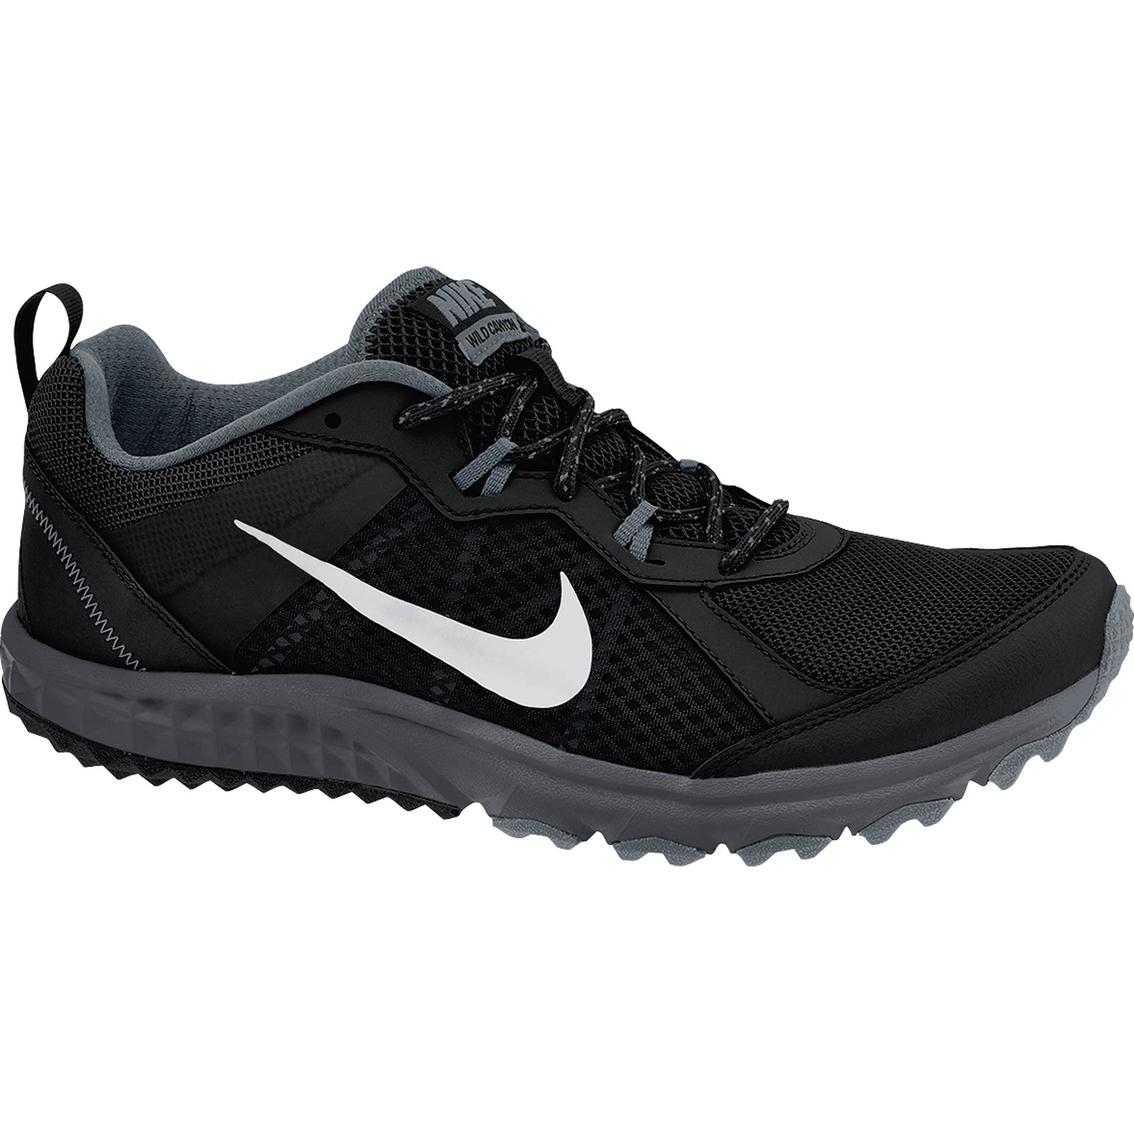 b9f0e8c5cf9 Nike Men s Wild Trail Running Shoes